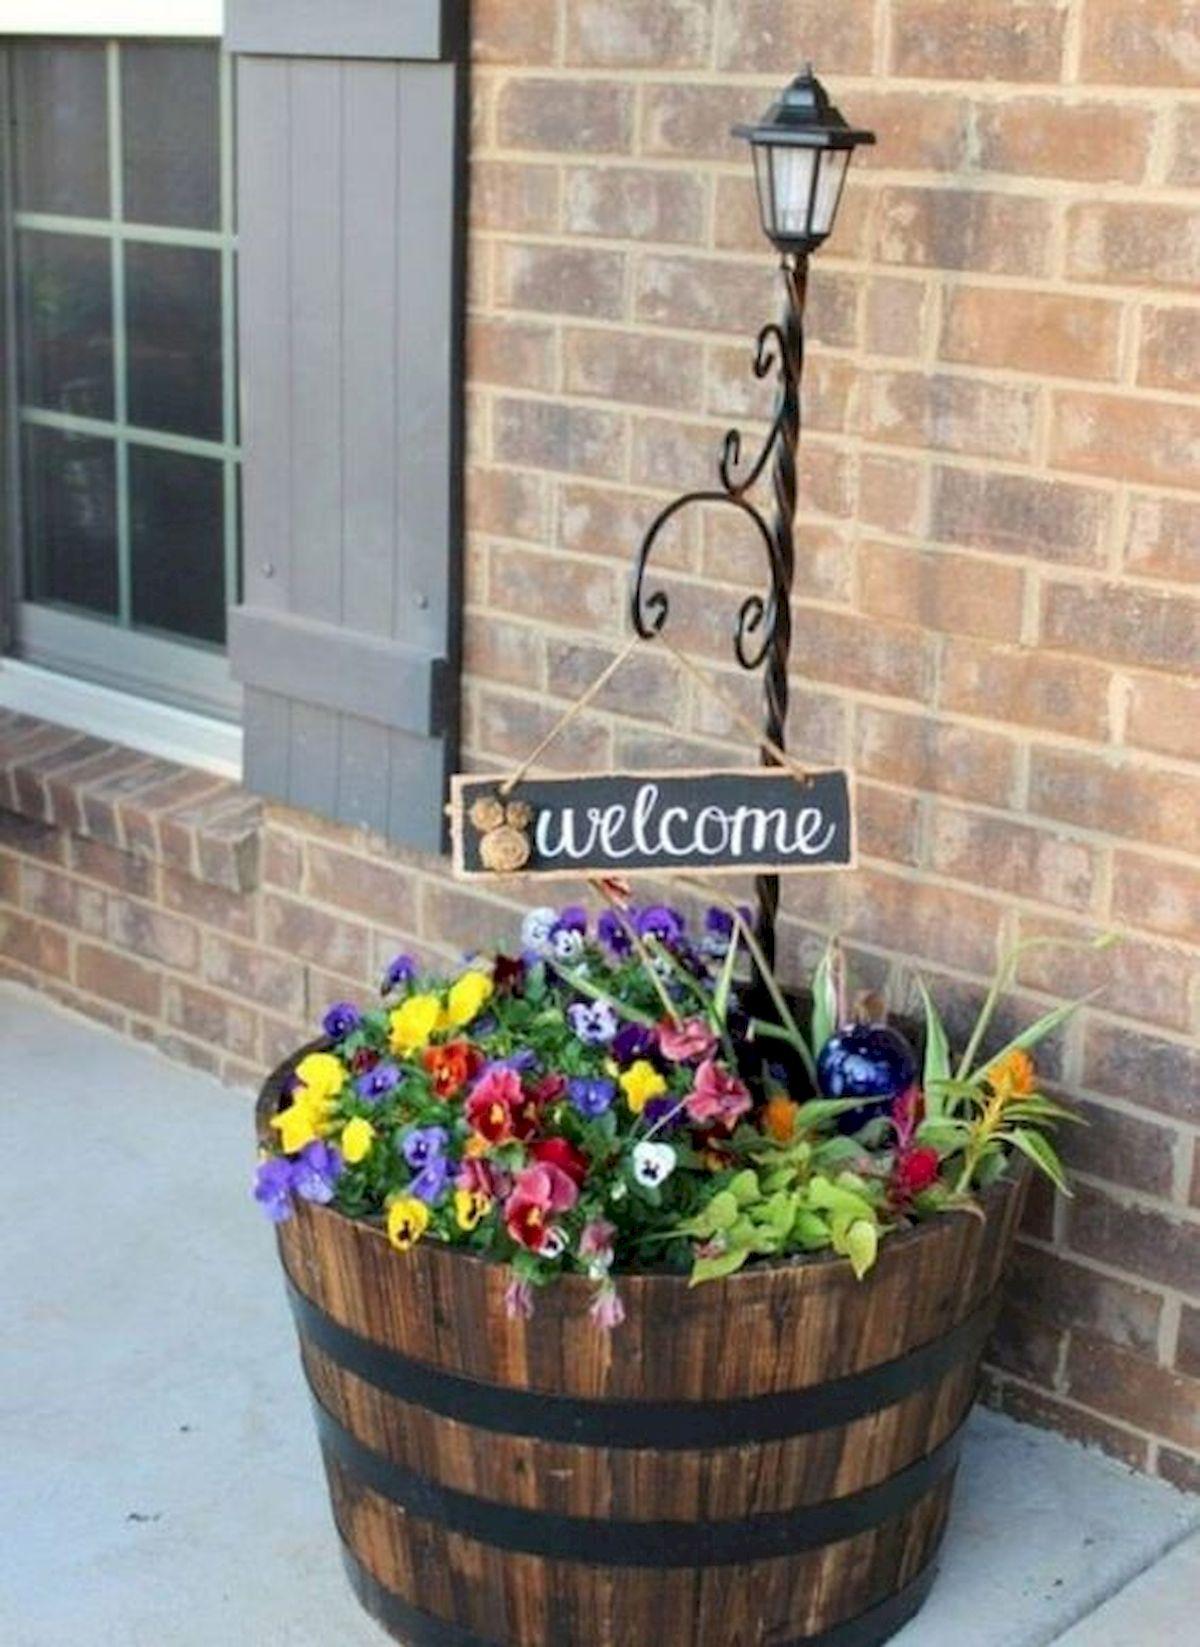 20 Fantastic DIY Planter Ideas for Your Front Porch (8)